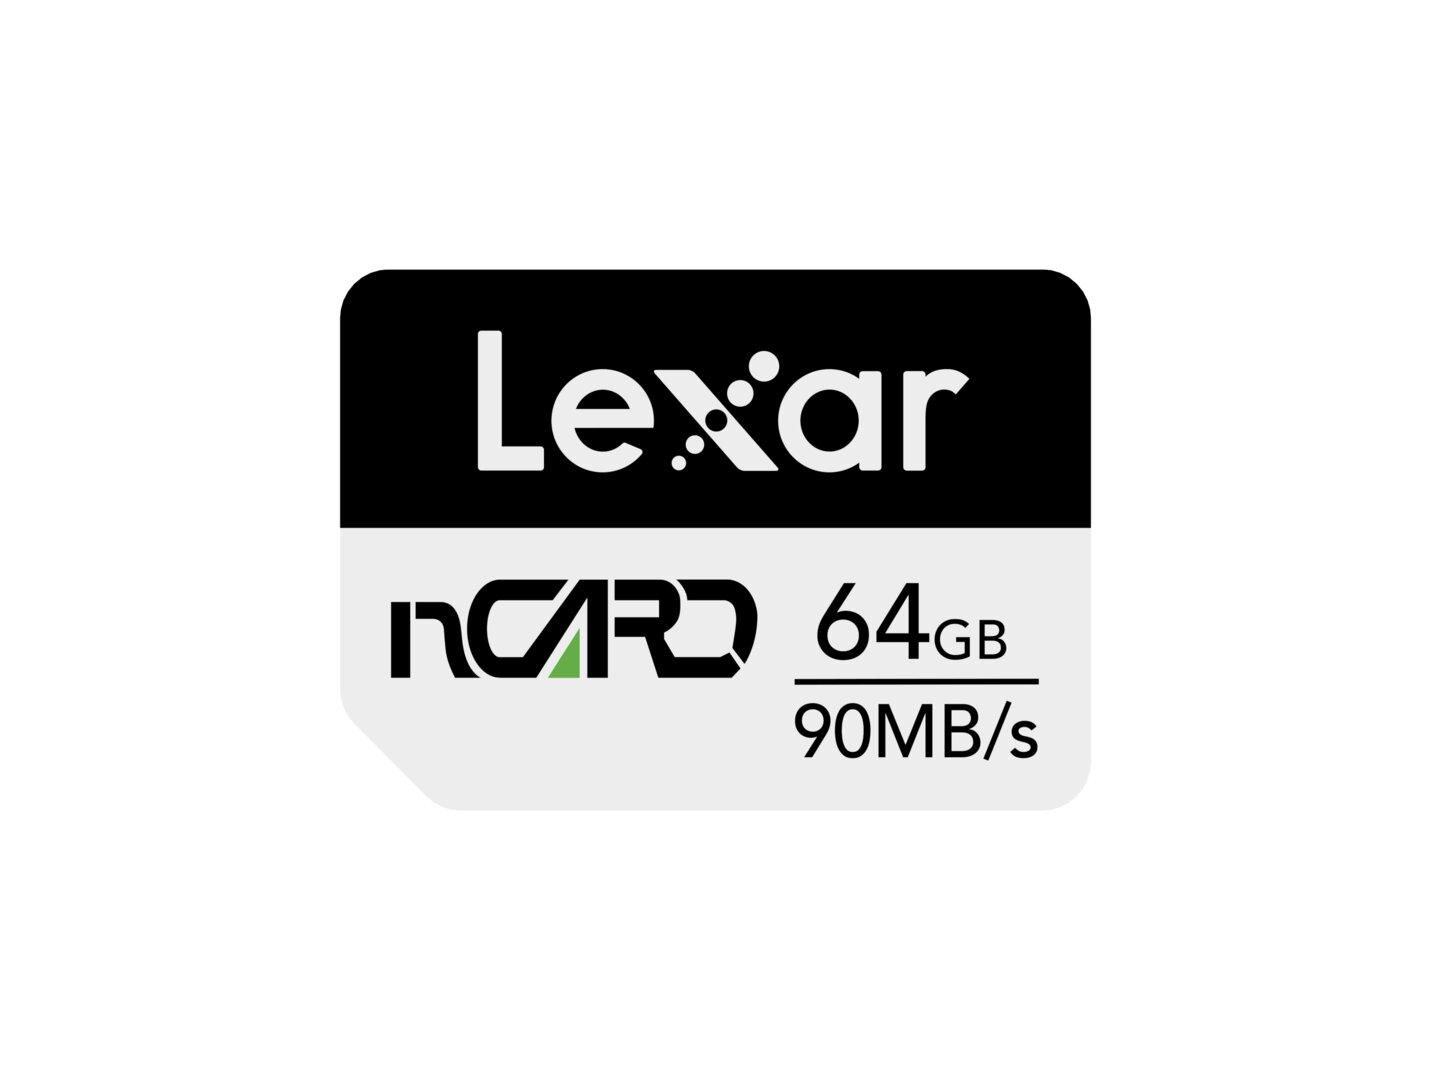 Lexar NM Card mit 64GB